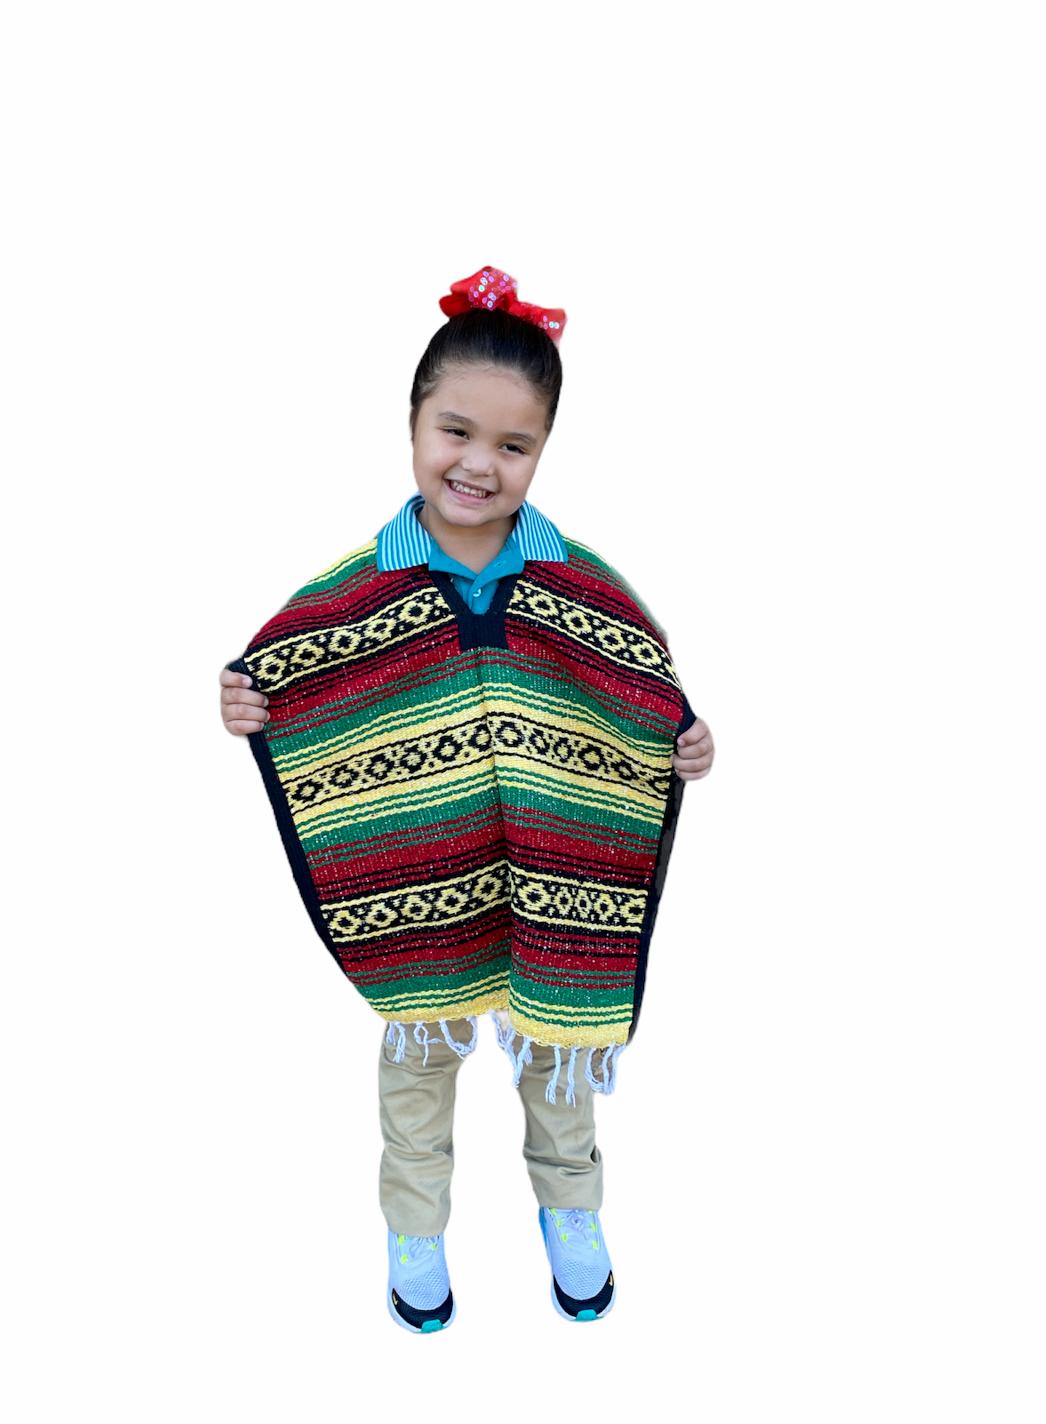 MEXICAN KIDS PONCHO , FALSA , COSTUME ,BLANKET SERAPE GABAN ,KIDS 5 - 9 , RASTA